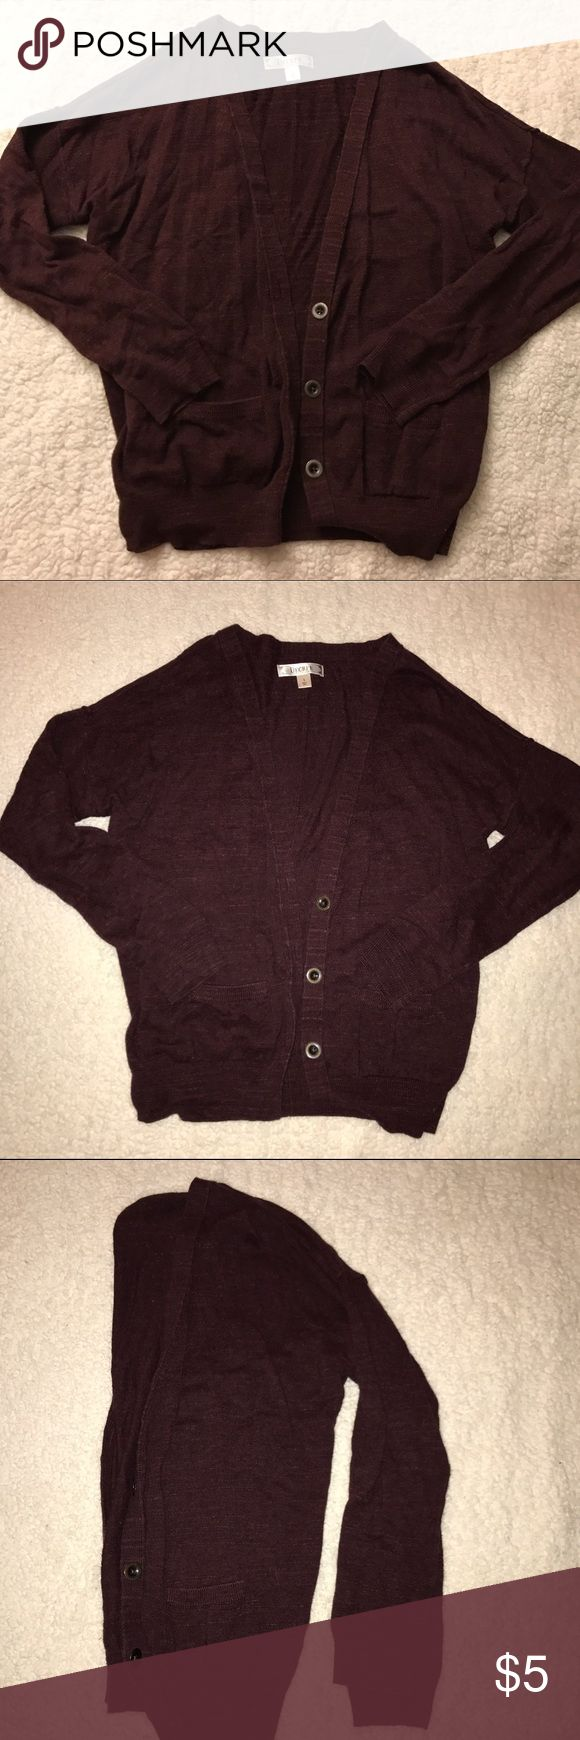 Maroon Cardigan Loose fit cardigan. Marled/heather maroon color. Sweaters Cardigans